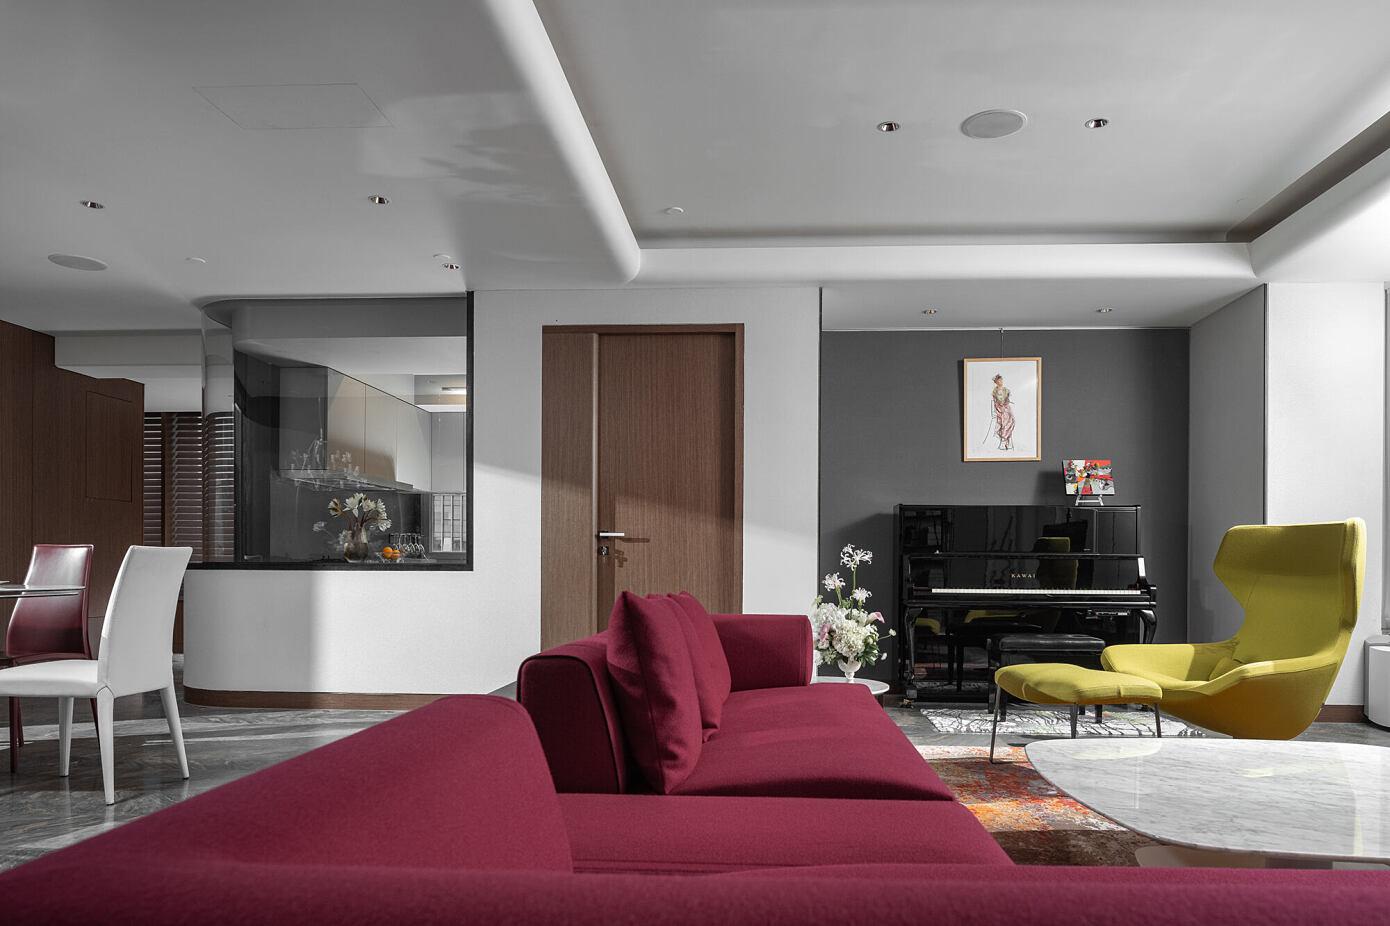 Yin's House by TanzoSpace